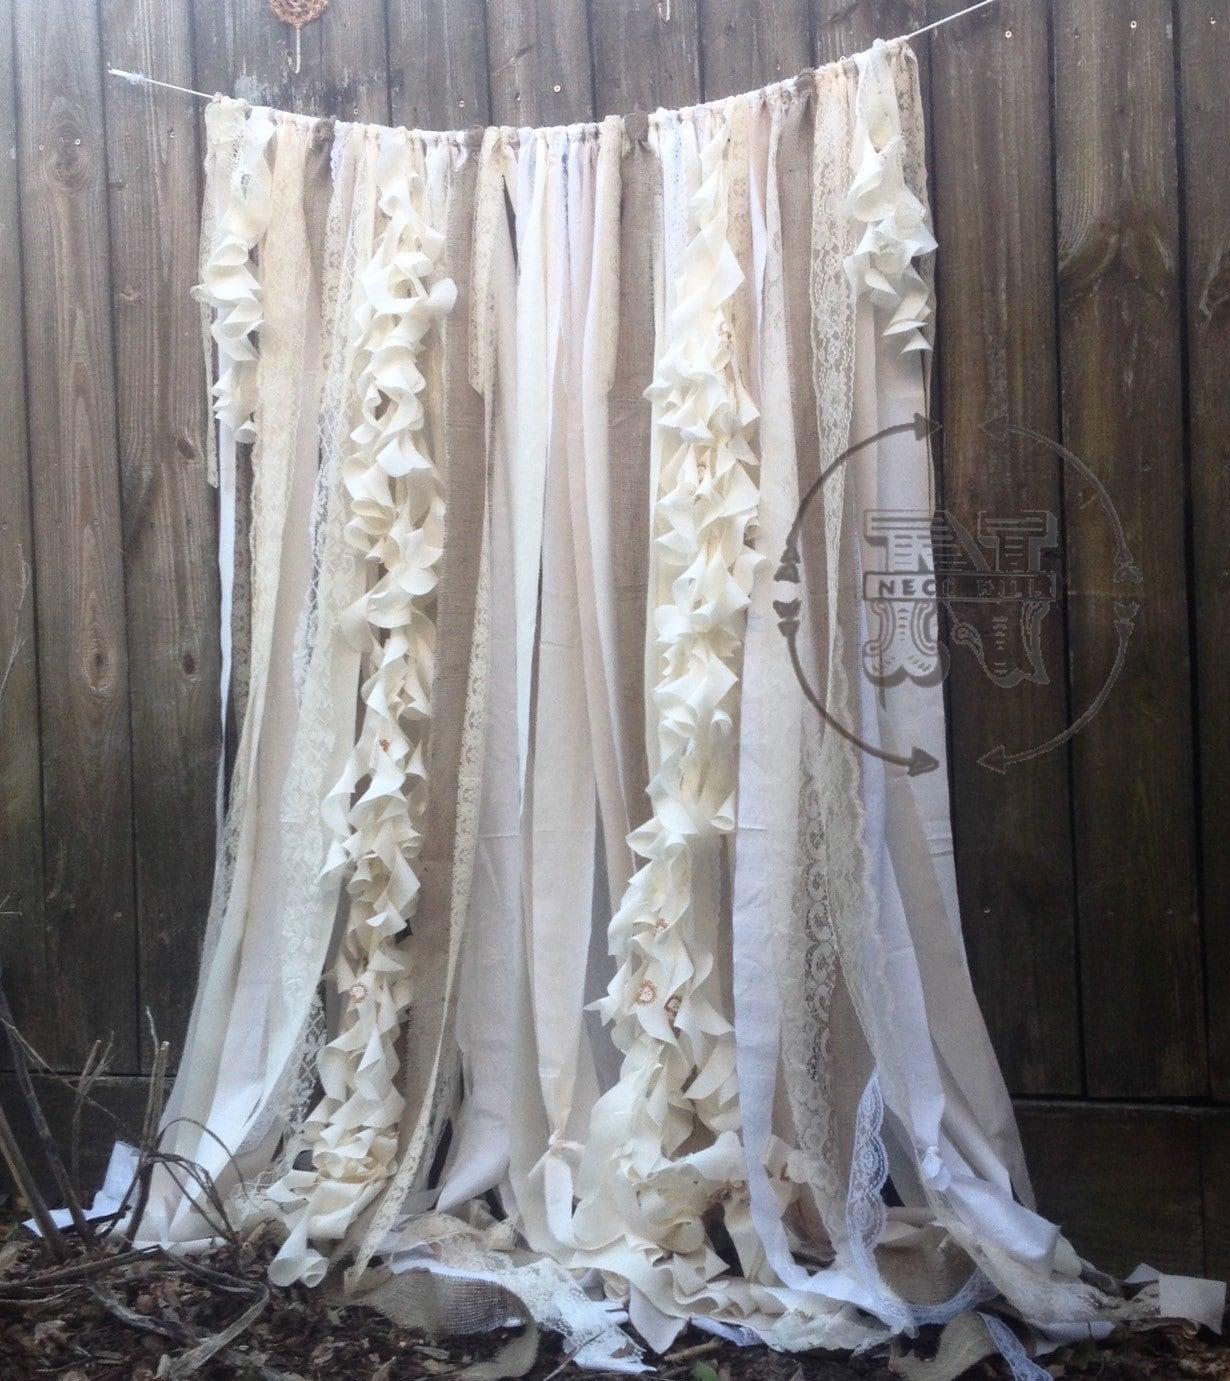 Ruffled sheer curtains